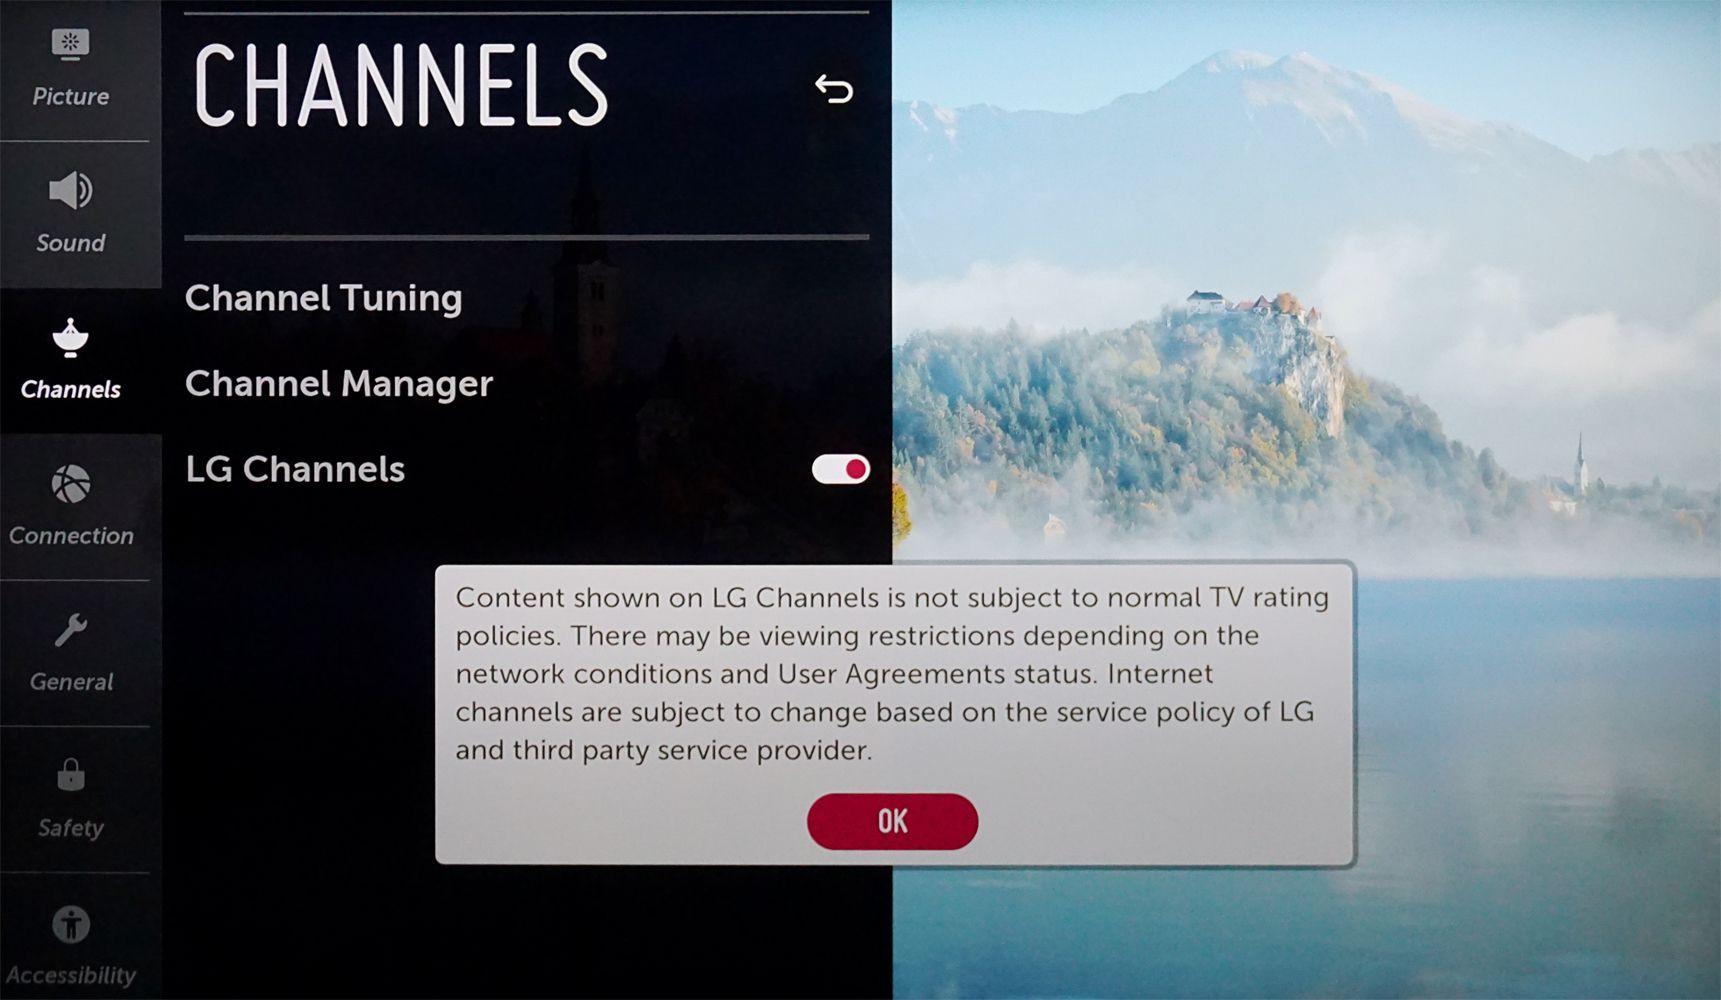 LG Channels – Parental Guide Notice